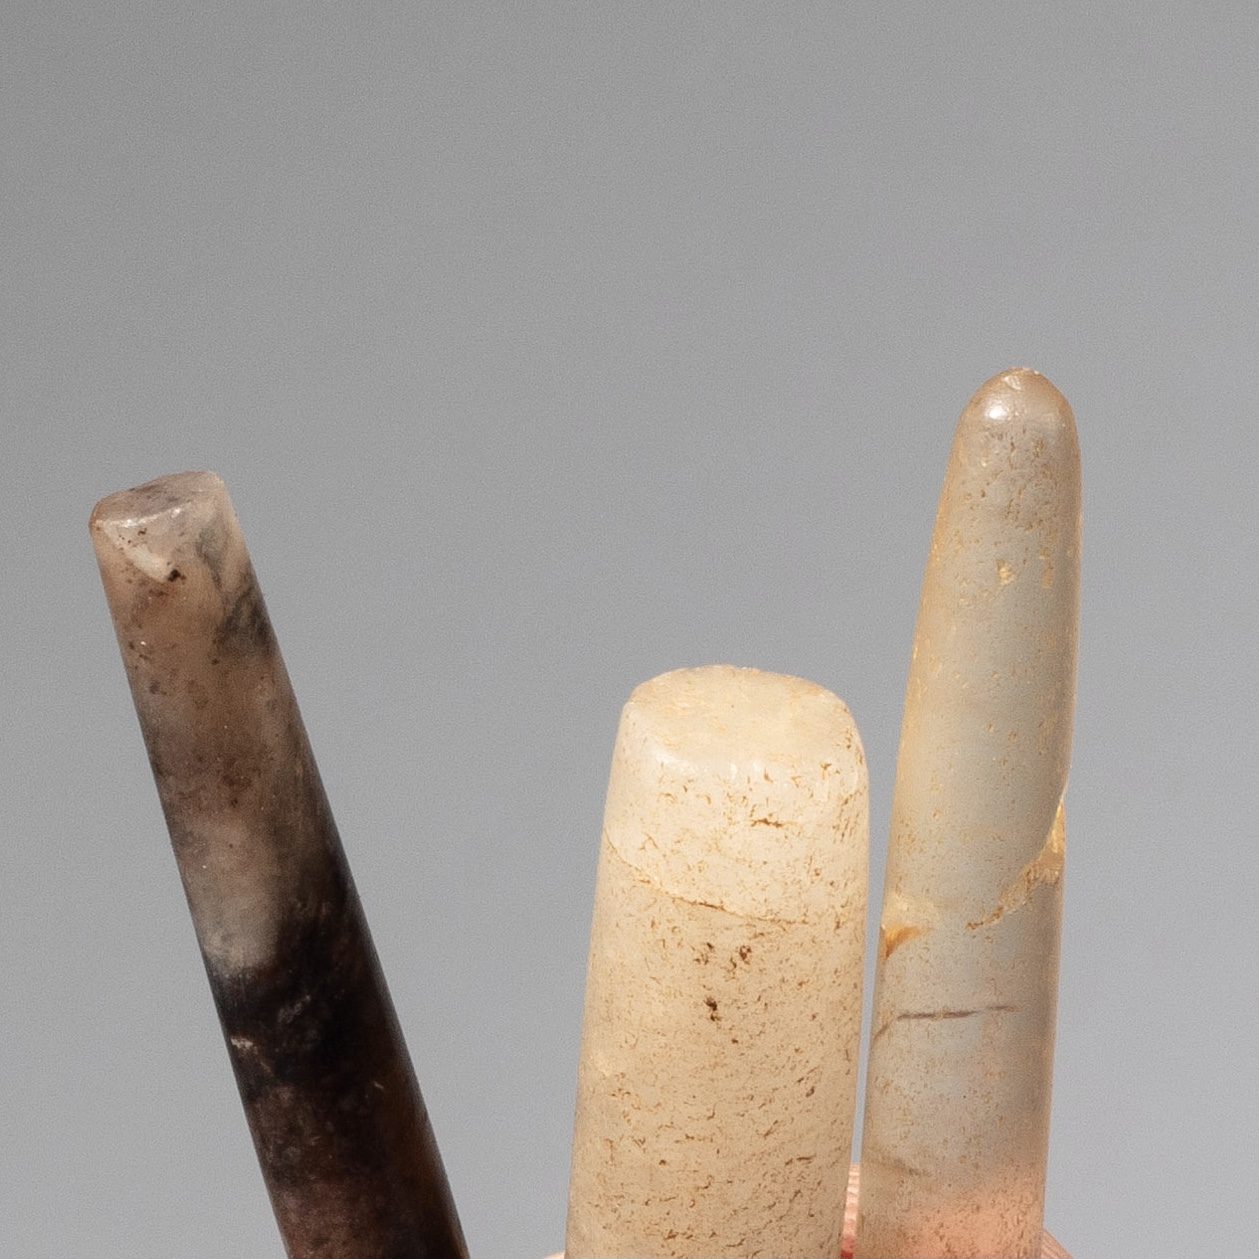 3 ETHEREAL ANCIENT STONE LIP PLUG LABARETS, SAHARA, W AFRICA ( No 4287)